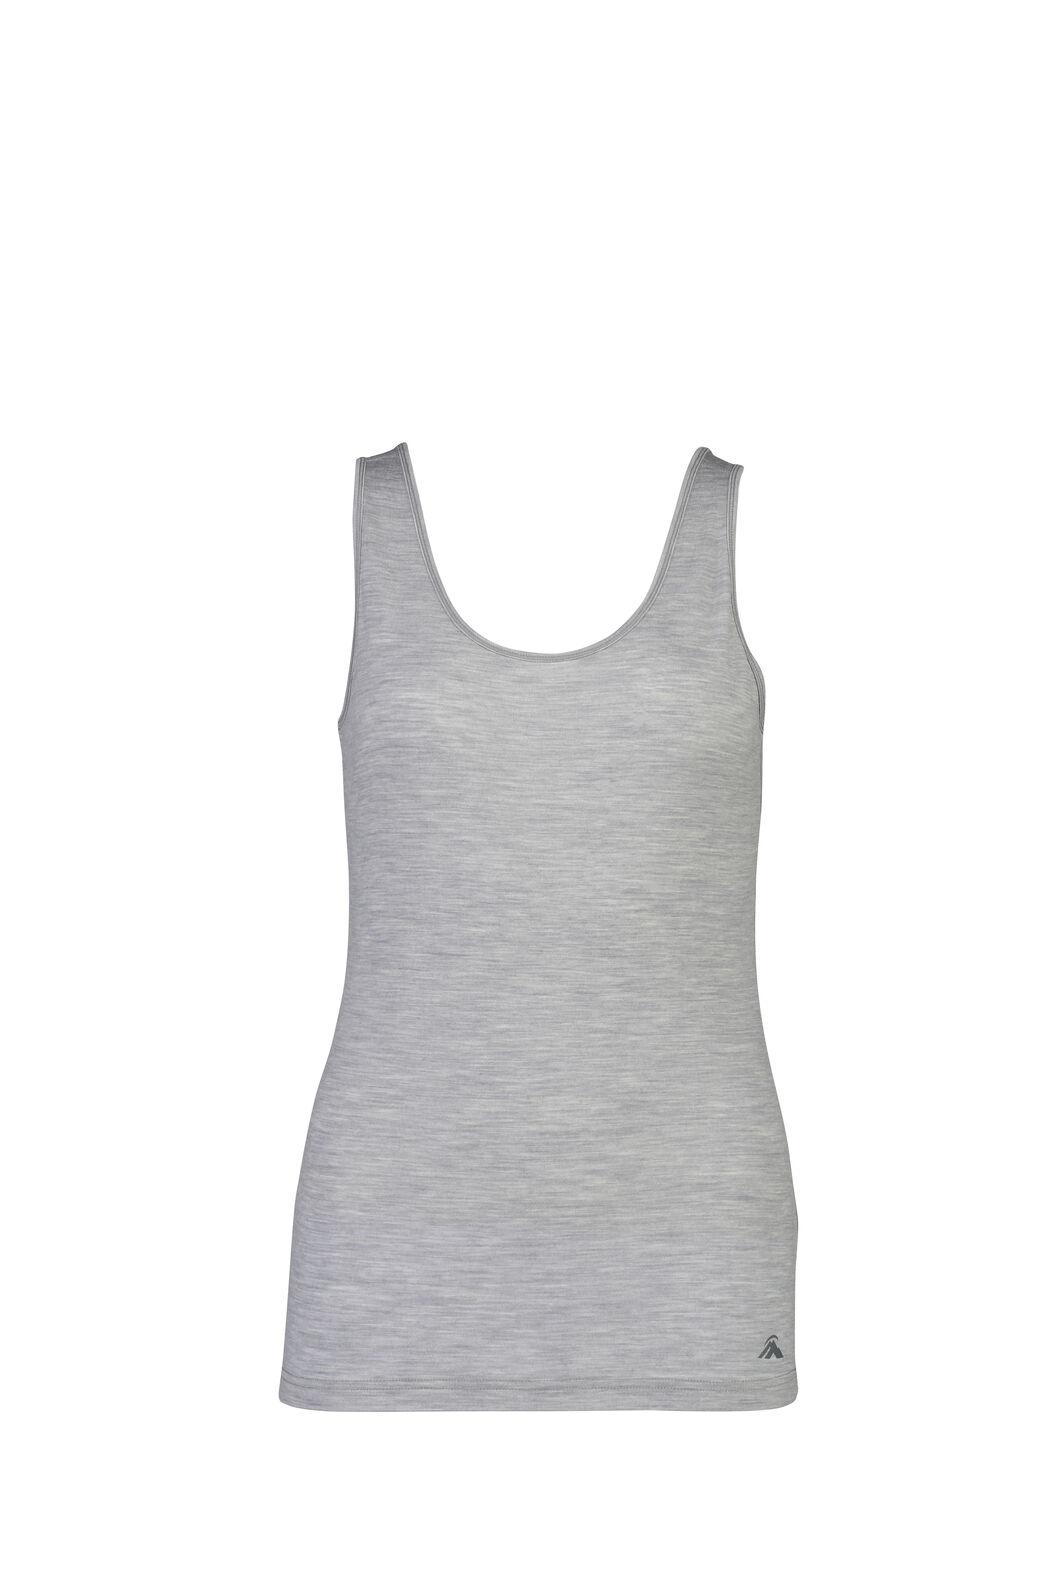 Macpac Women's 150 Merino Singlet, Light Grey Marle, hi-res